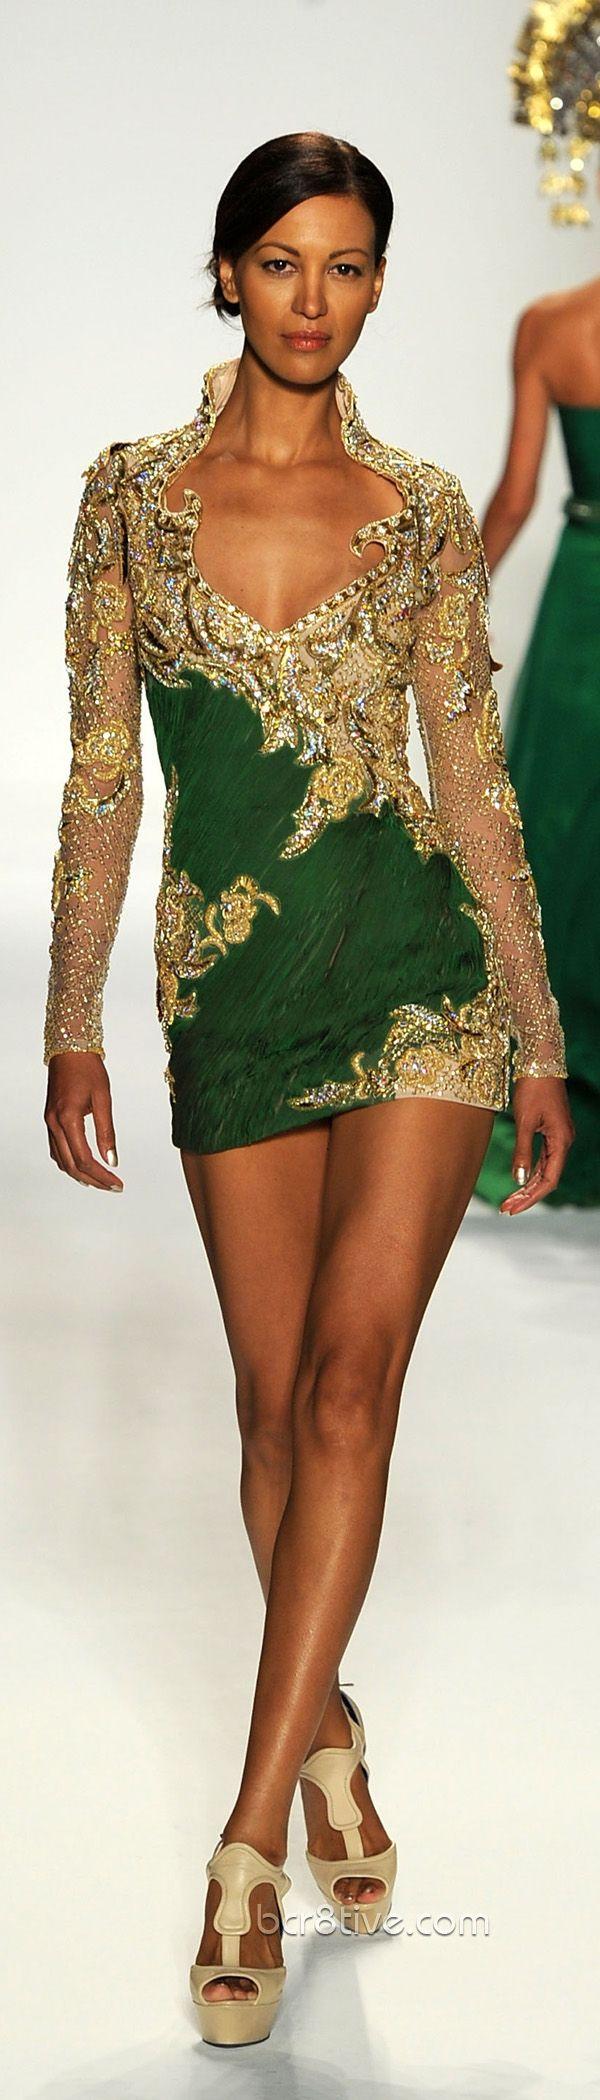 Farah Angsana Mercedes Benz Fashion Week 2011...awesome neckline!!!!